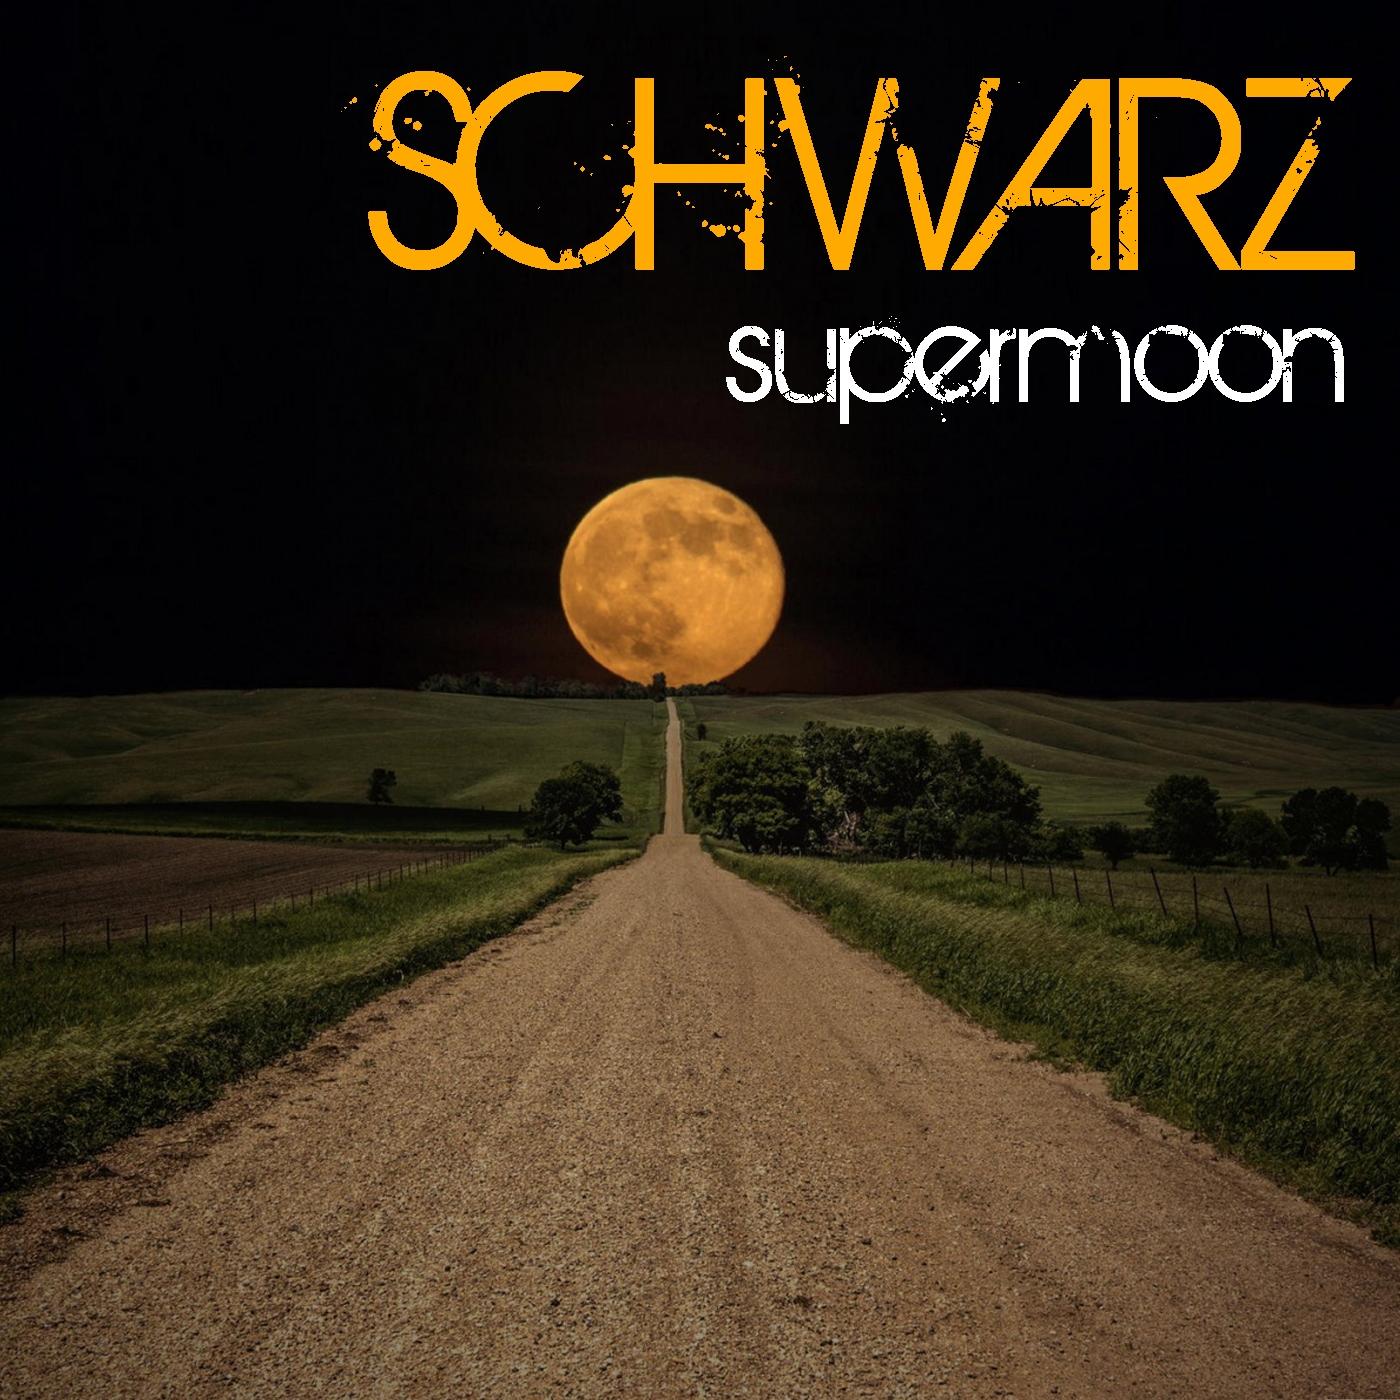 Schwarz - Levels Of Ecstasy (Original Mix)